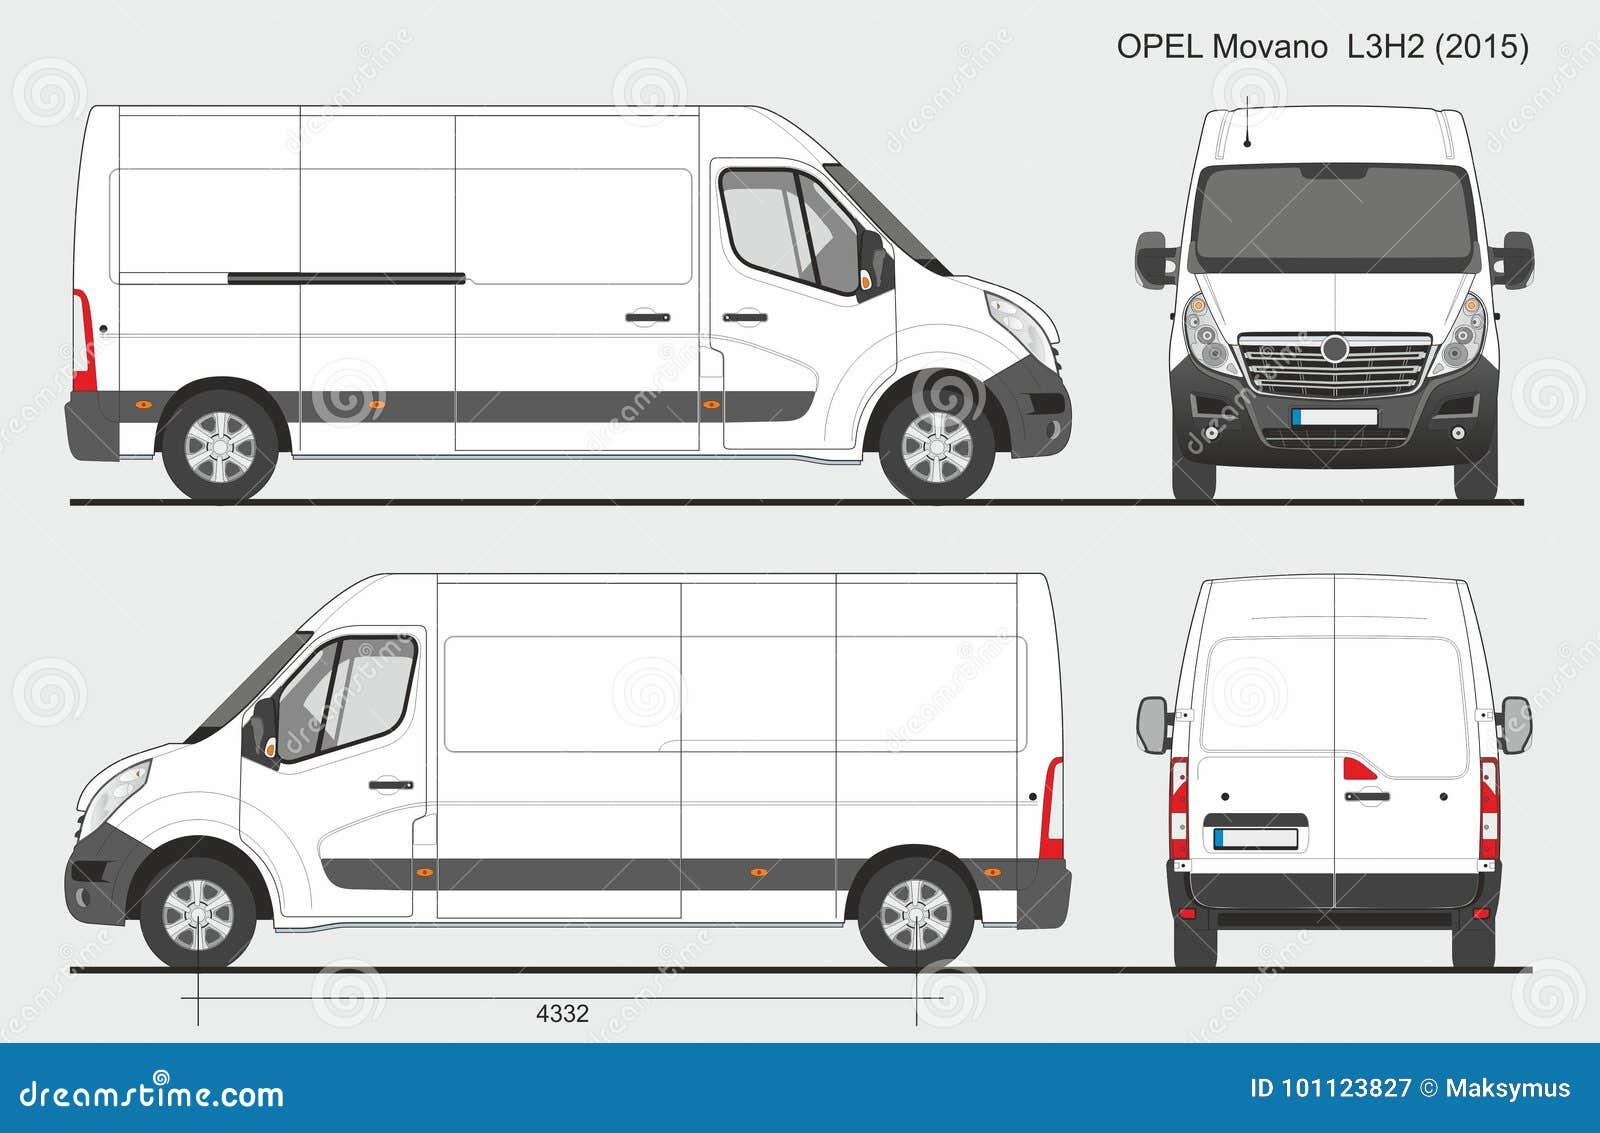 opel movano cargo van l3h2 2015 photographie ditorial illustration du commercial cargaison. Black Bedroom Furniture Sets. Home Design Ideas